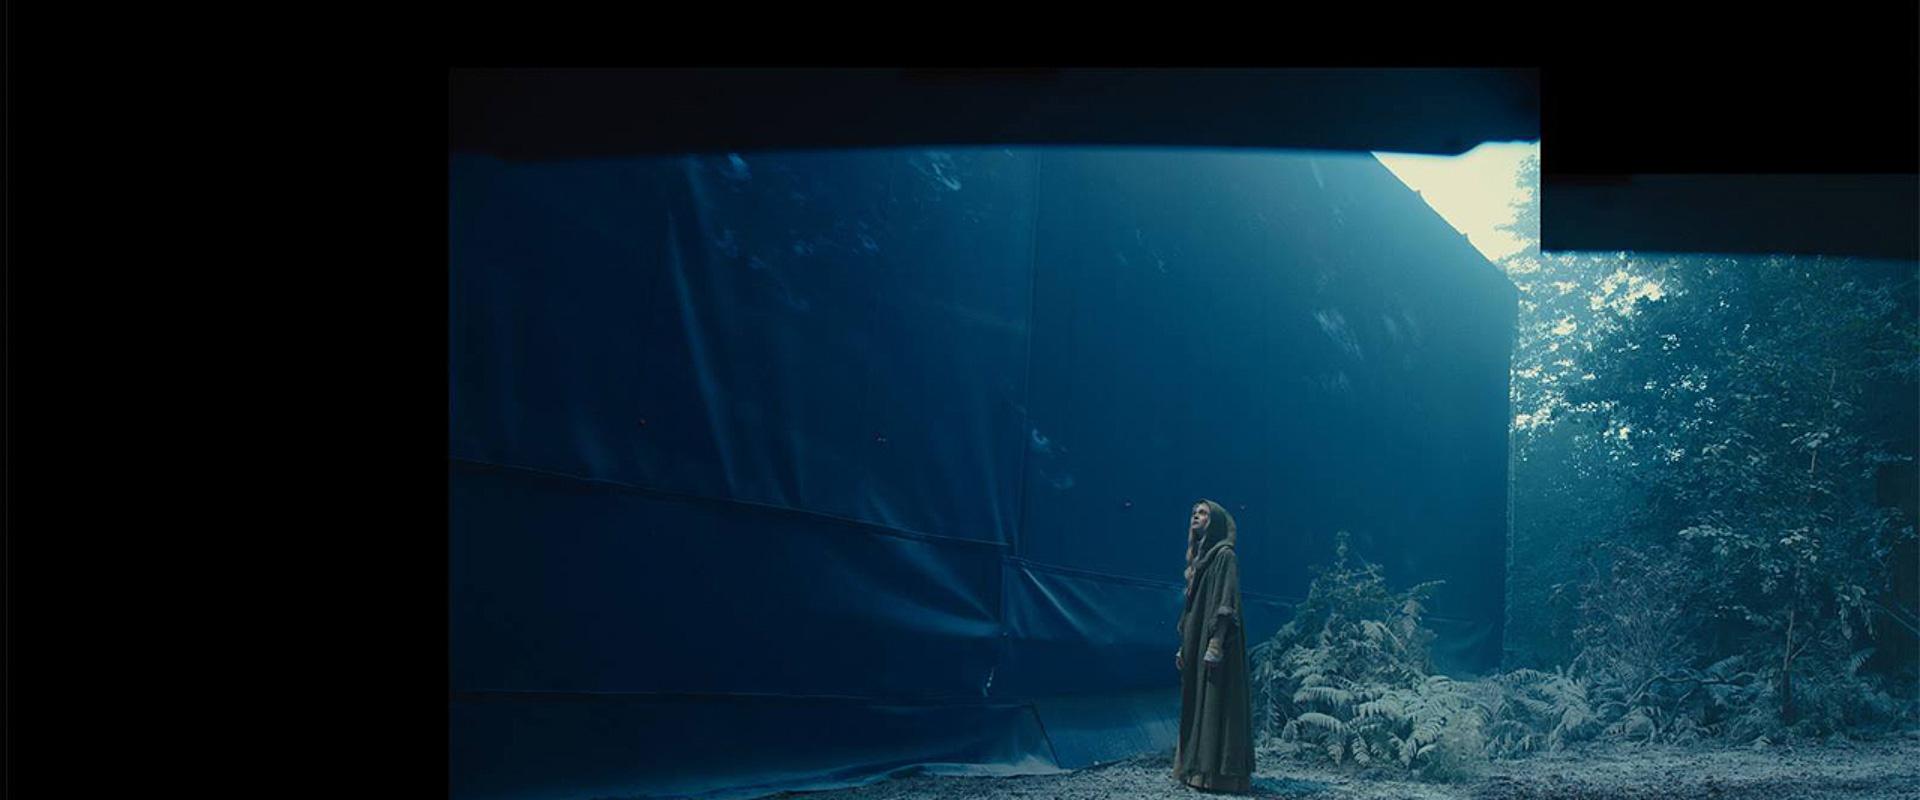 3.-Maleficent_Plate_IgorStaritsin.jpg